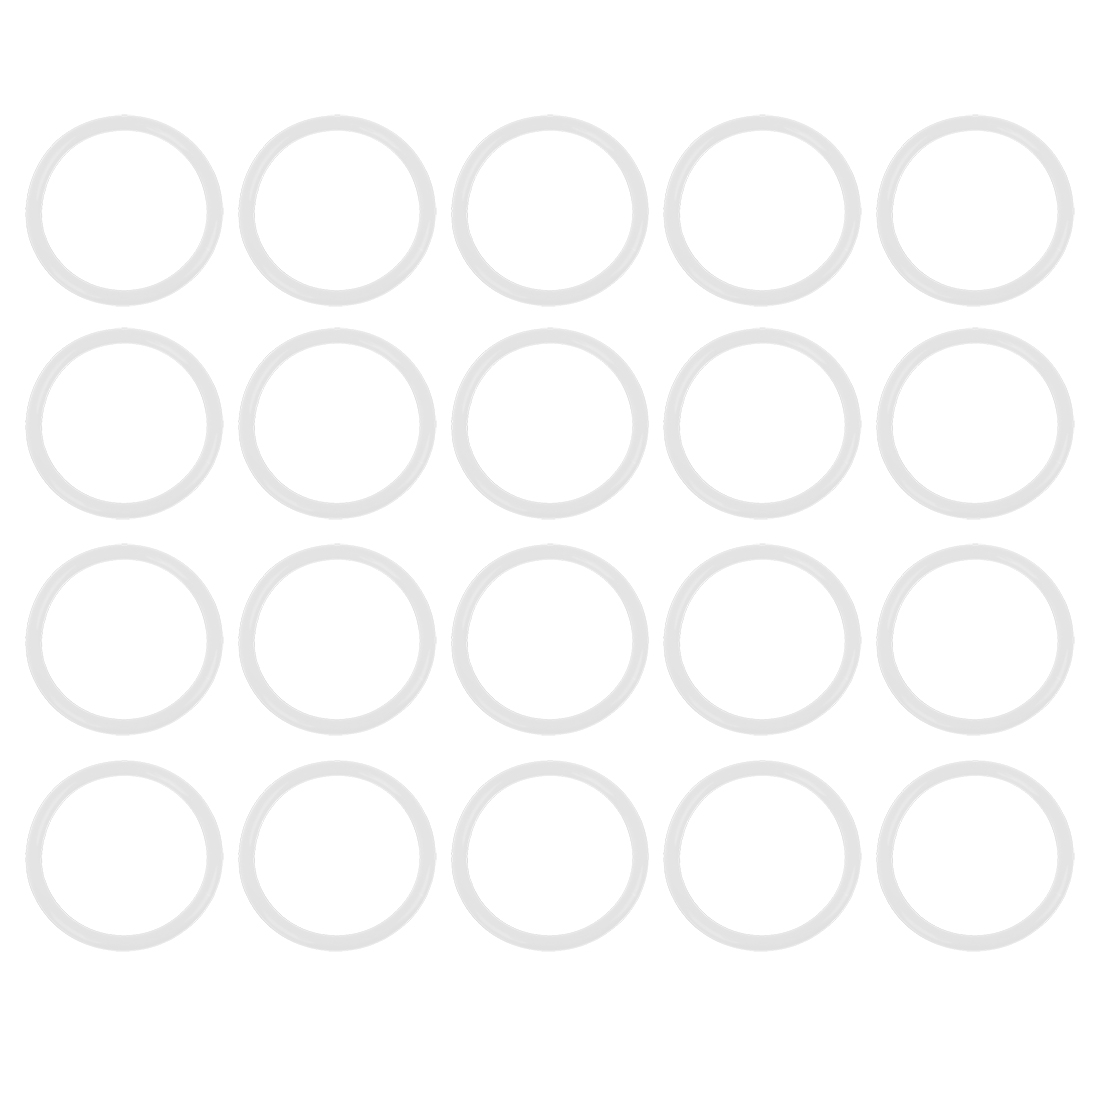 20pcs 45x3.5mm White Universal Silicone O-Ring Sealing Washer Gasket for Car